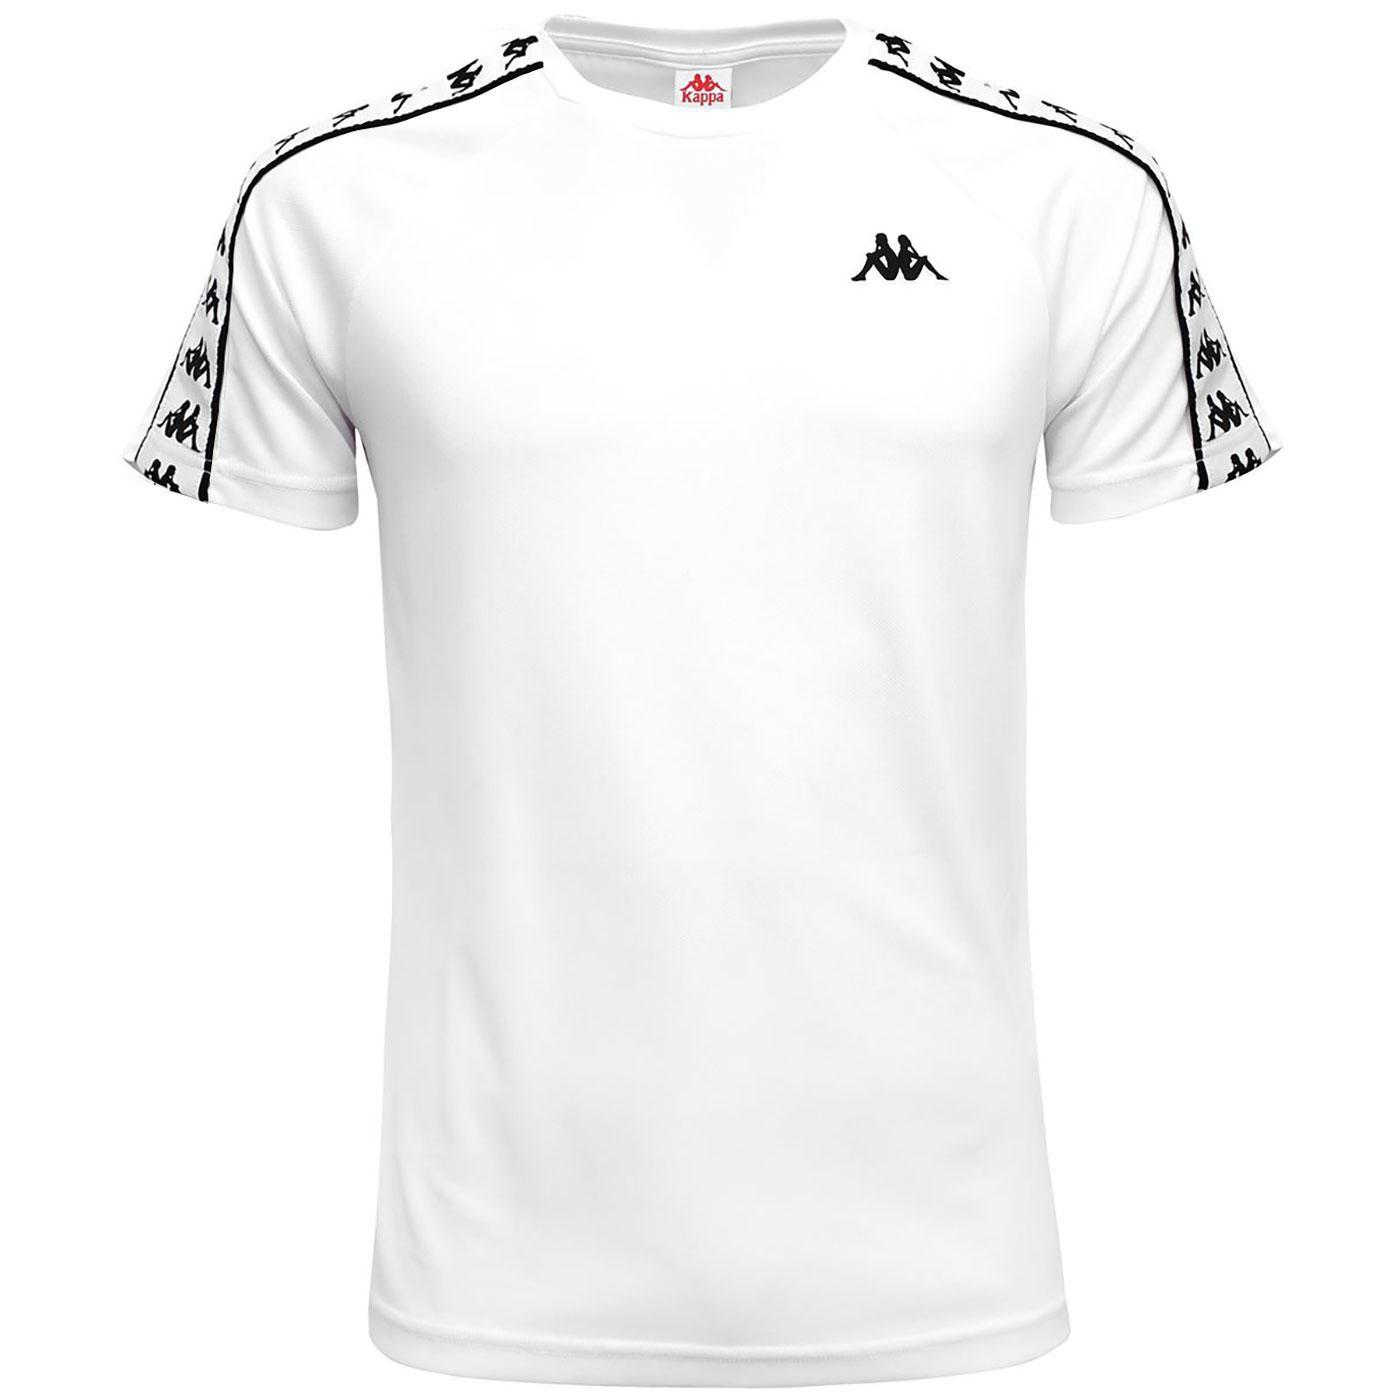 Coen KAPPA Retro 80's Tape Sleeve T-Shirt WHITE